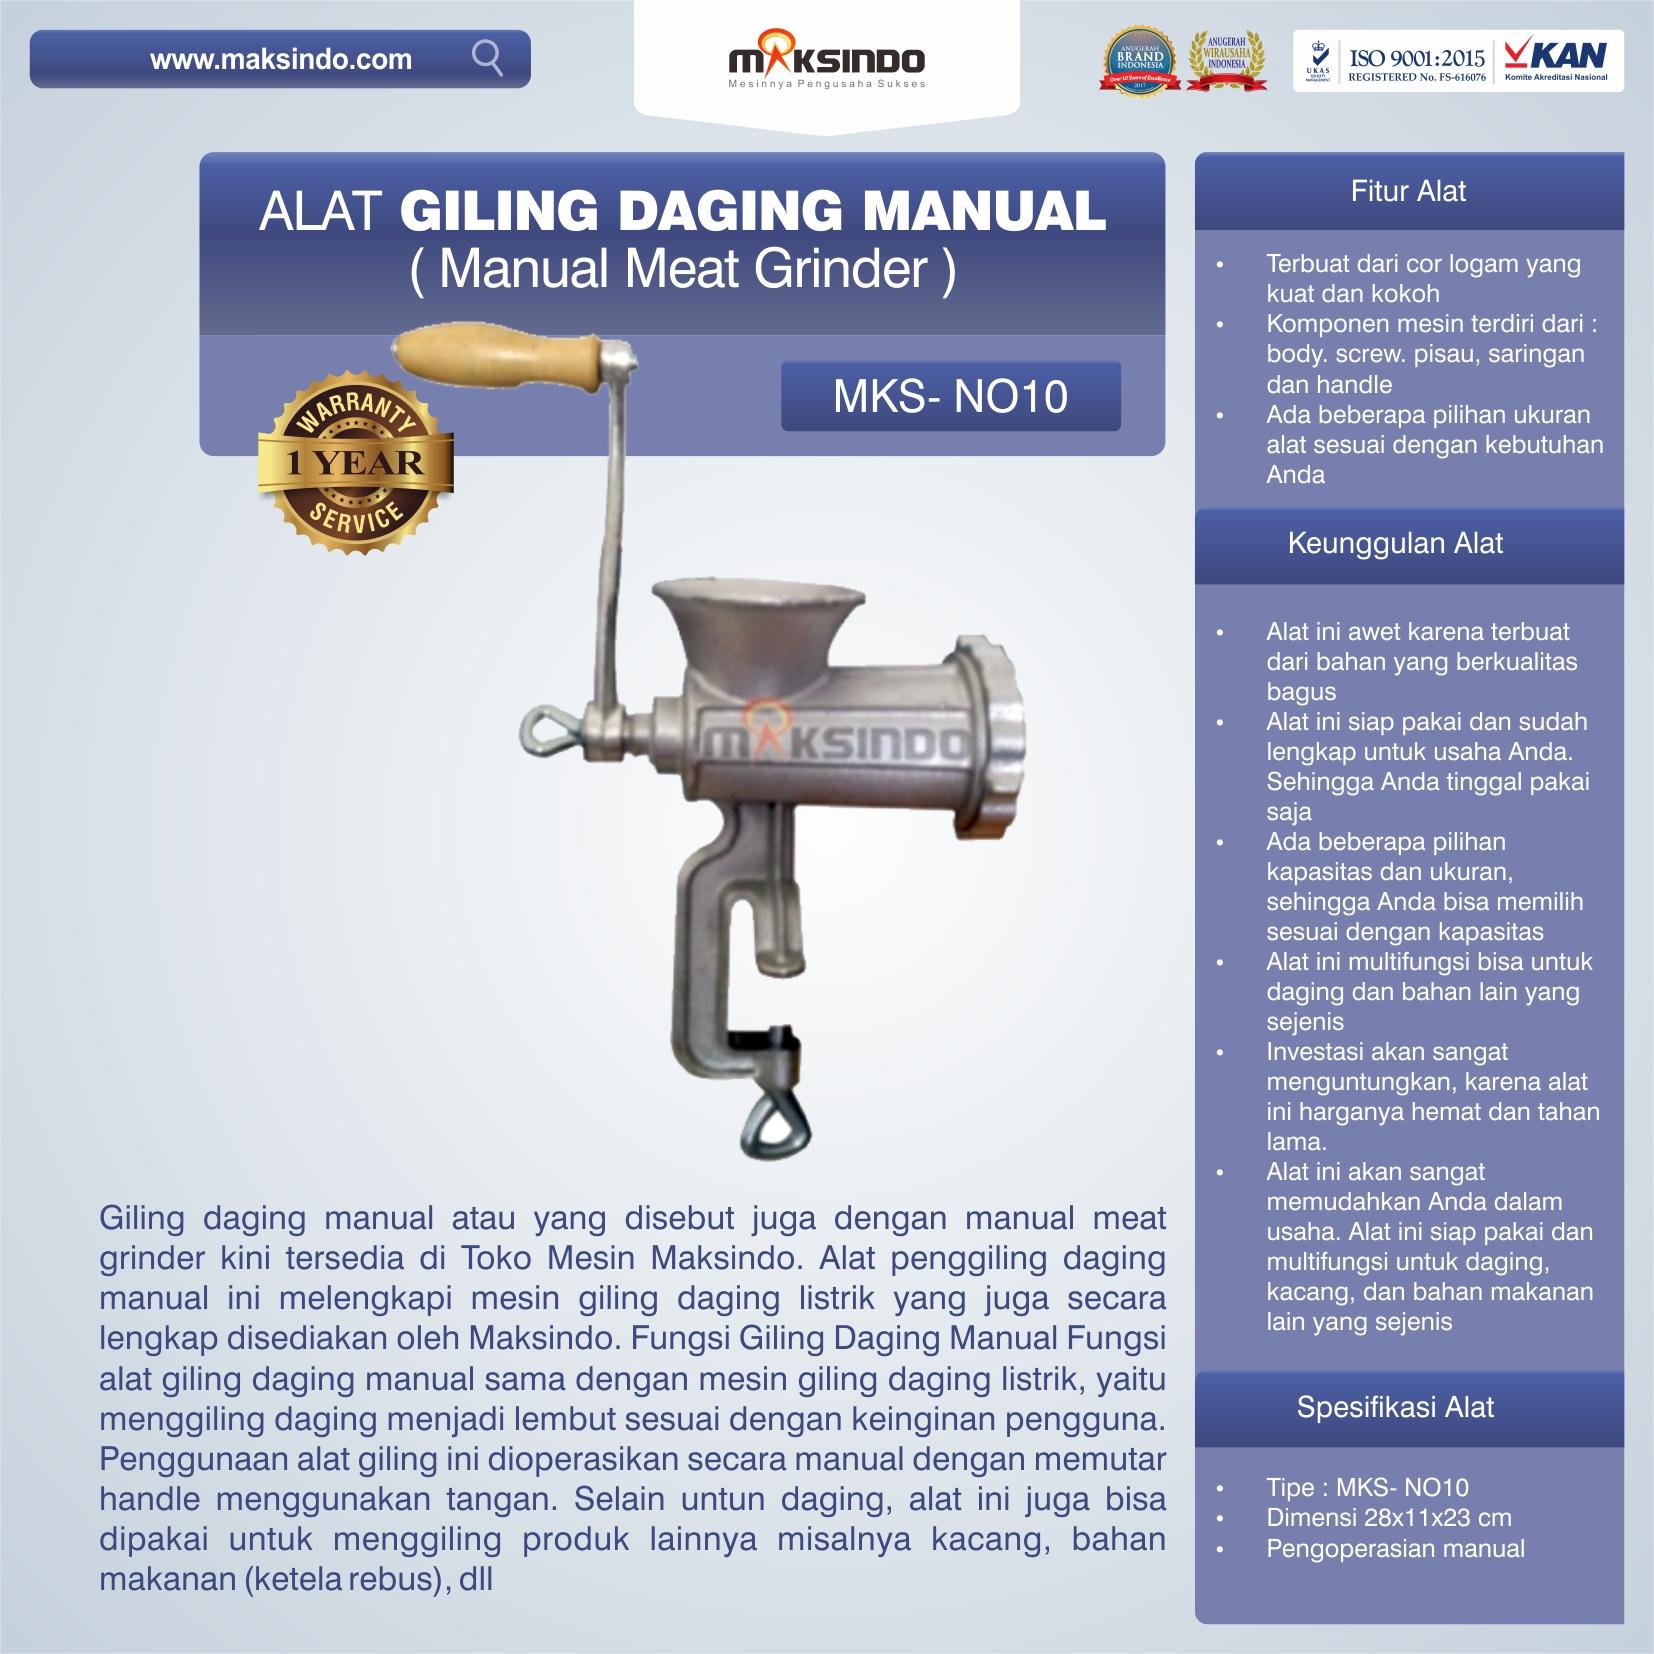 Jual Alat Giling Daging Manual (Iron) di Bandung